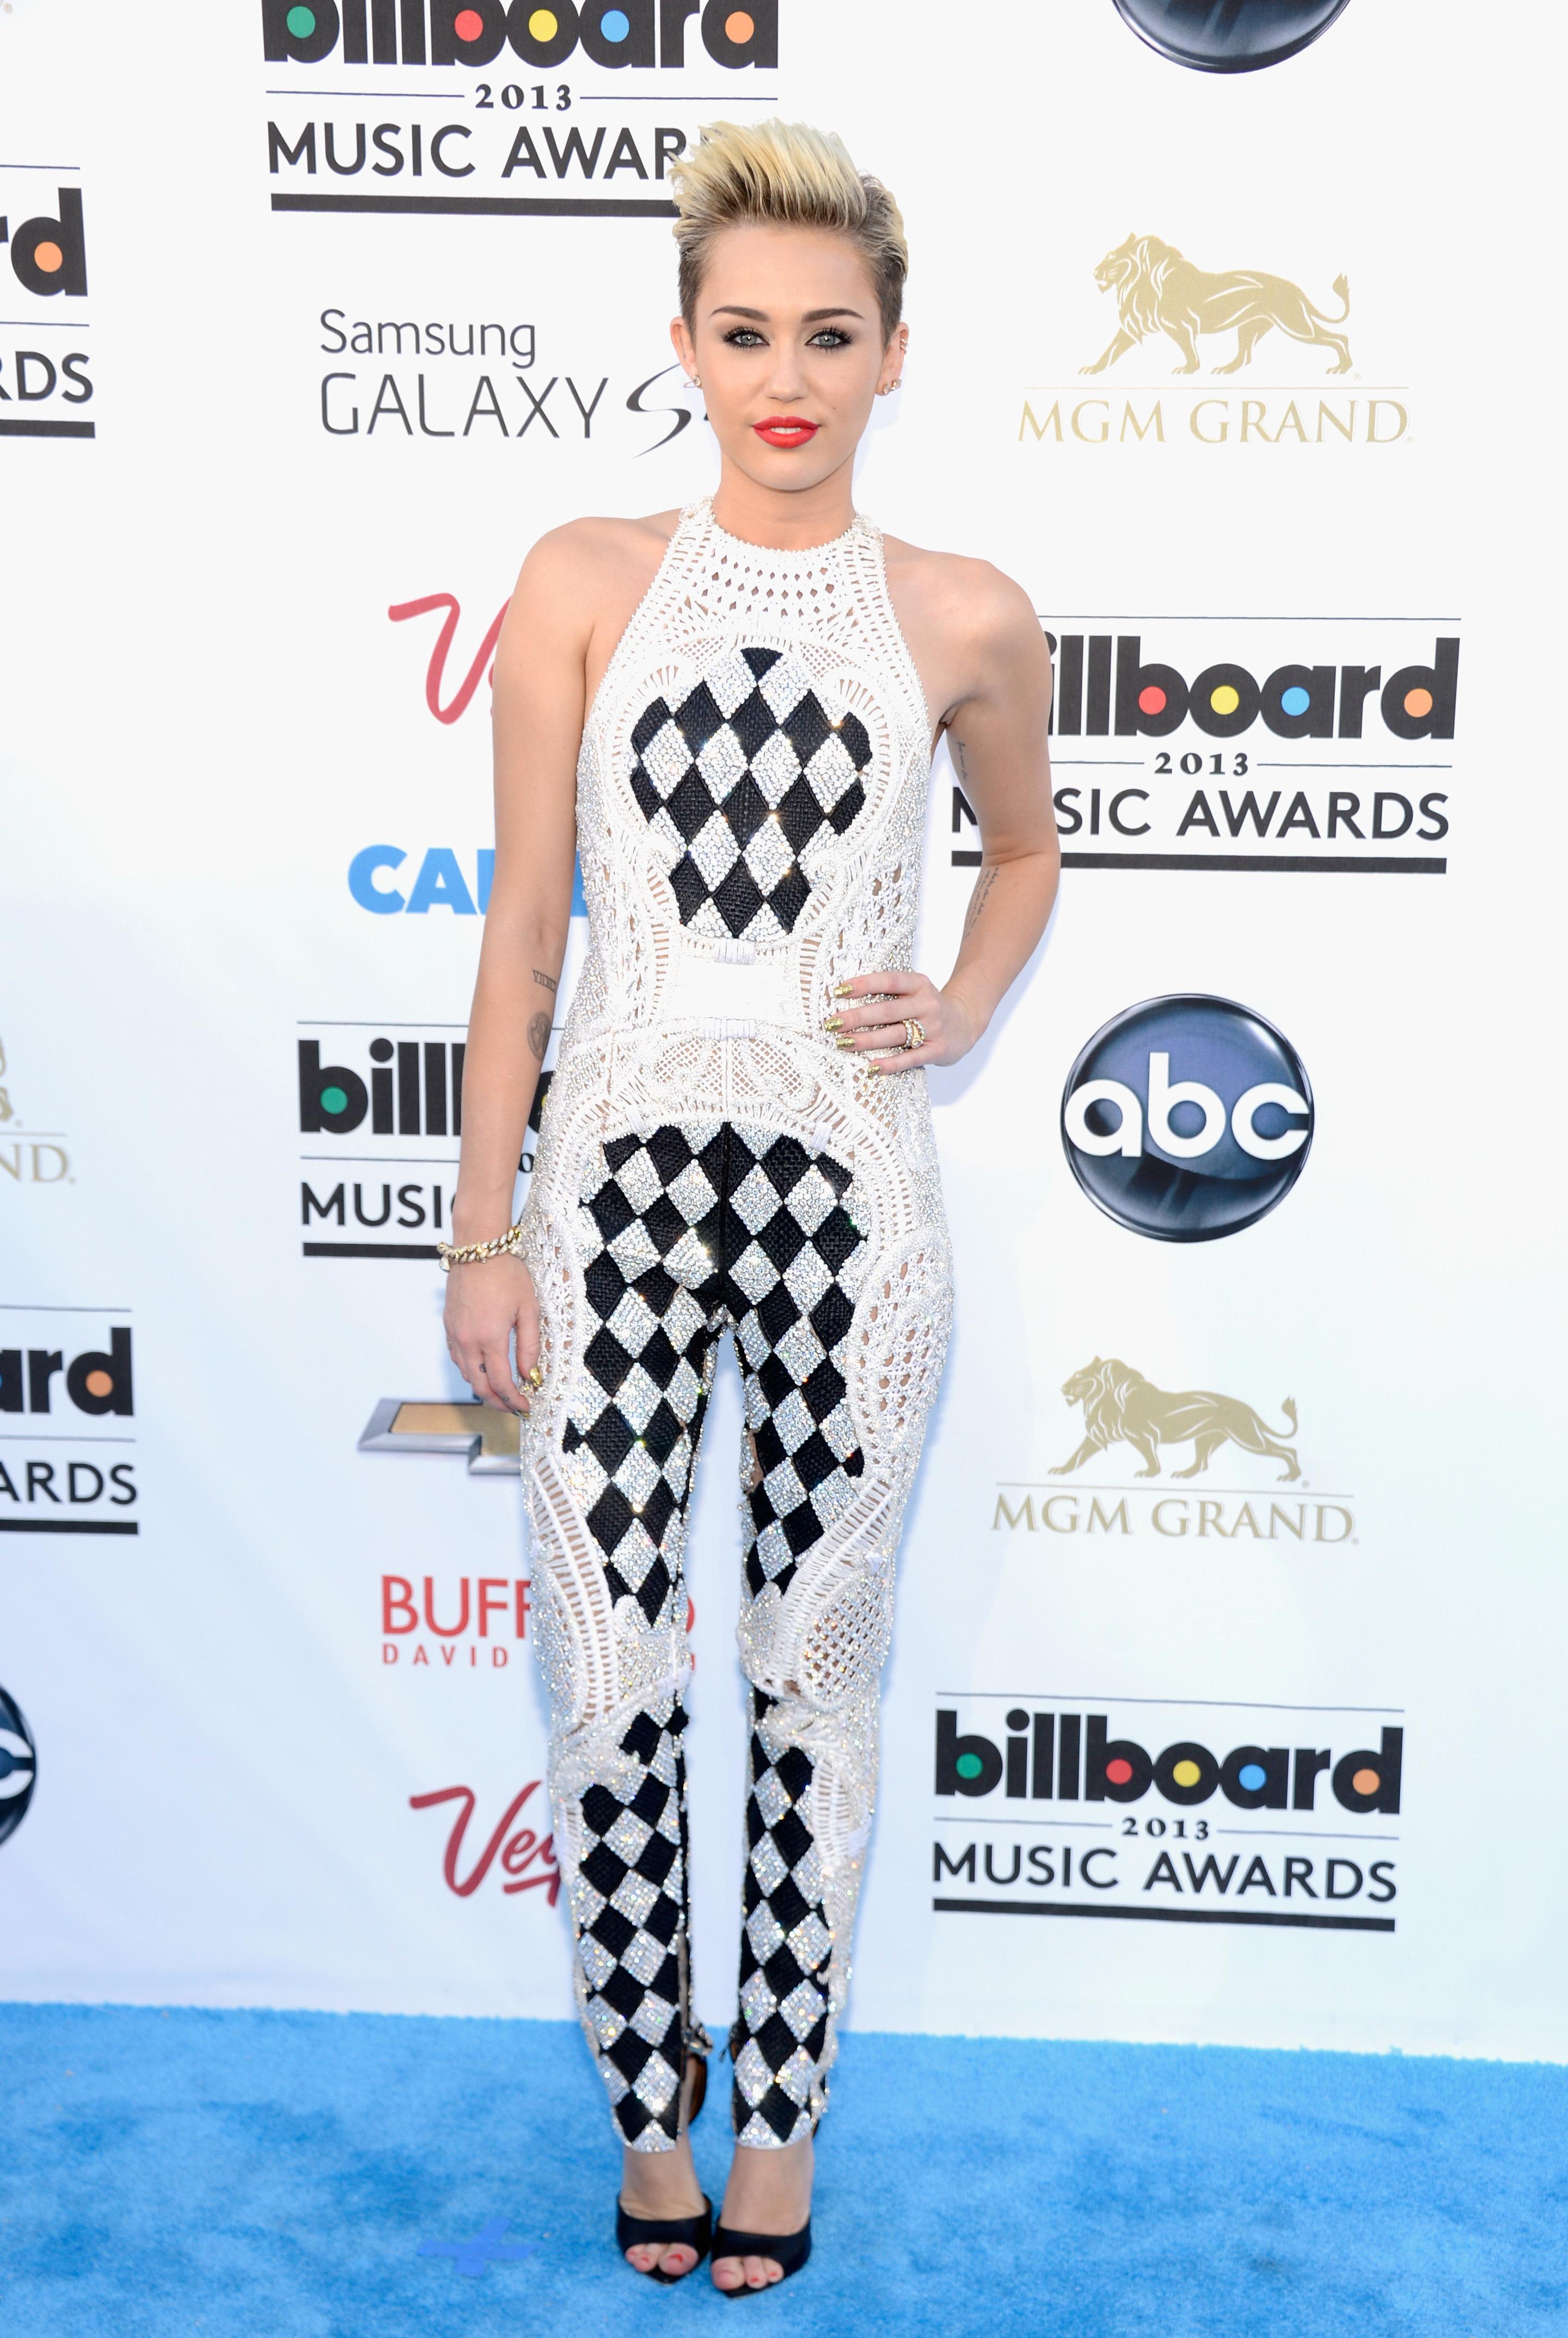 miley cyrus bing pop stars behaving badly